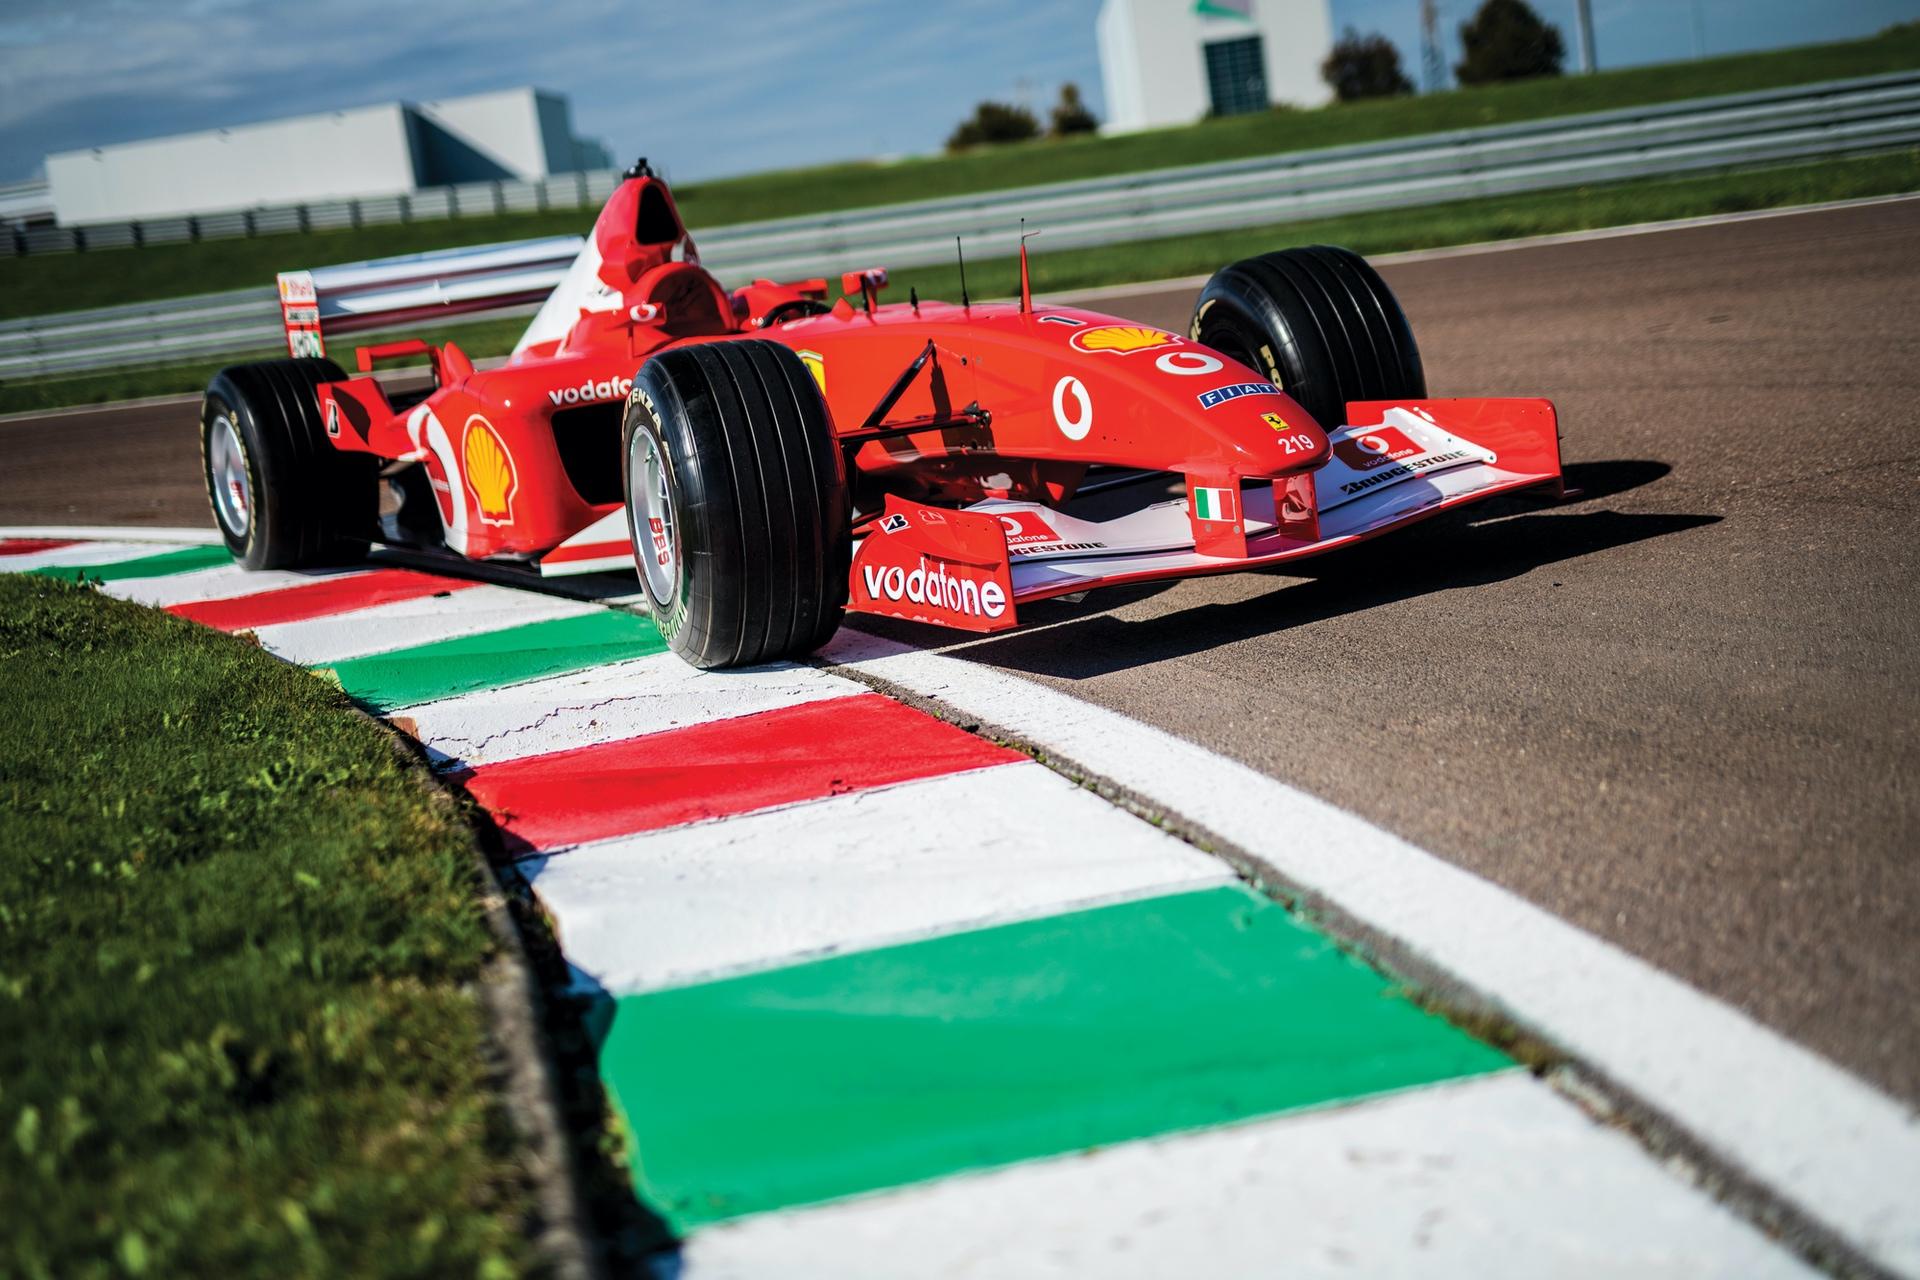 Mick_Schumacher_Ferrari_F2002_0019